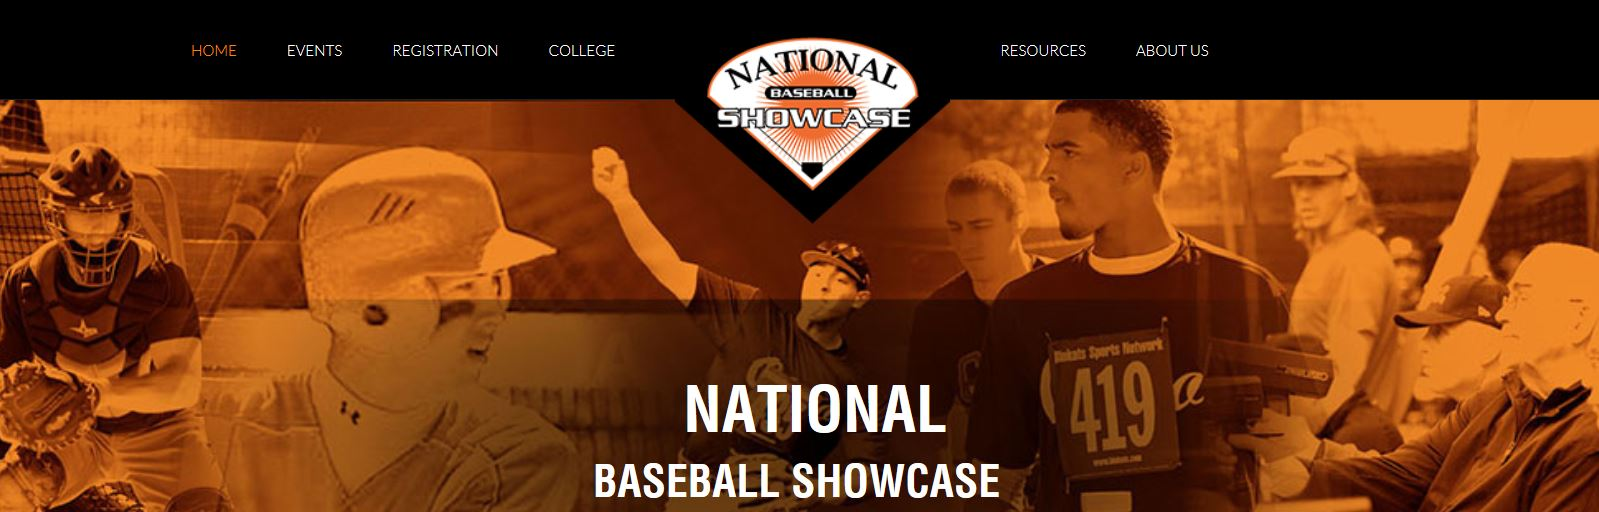 National Baseball Showcase